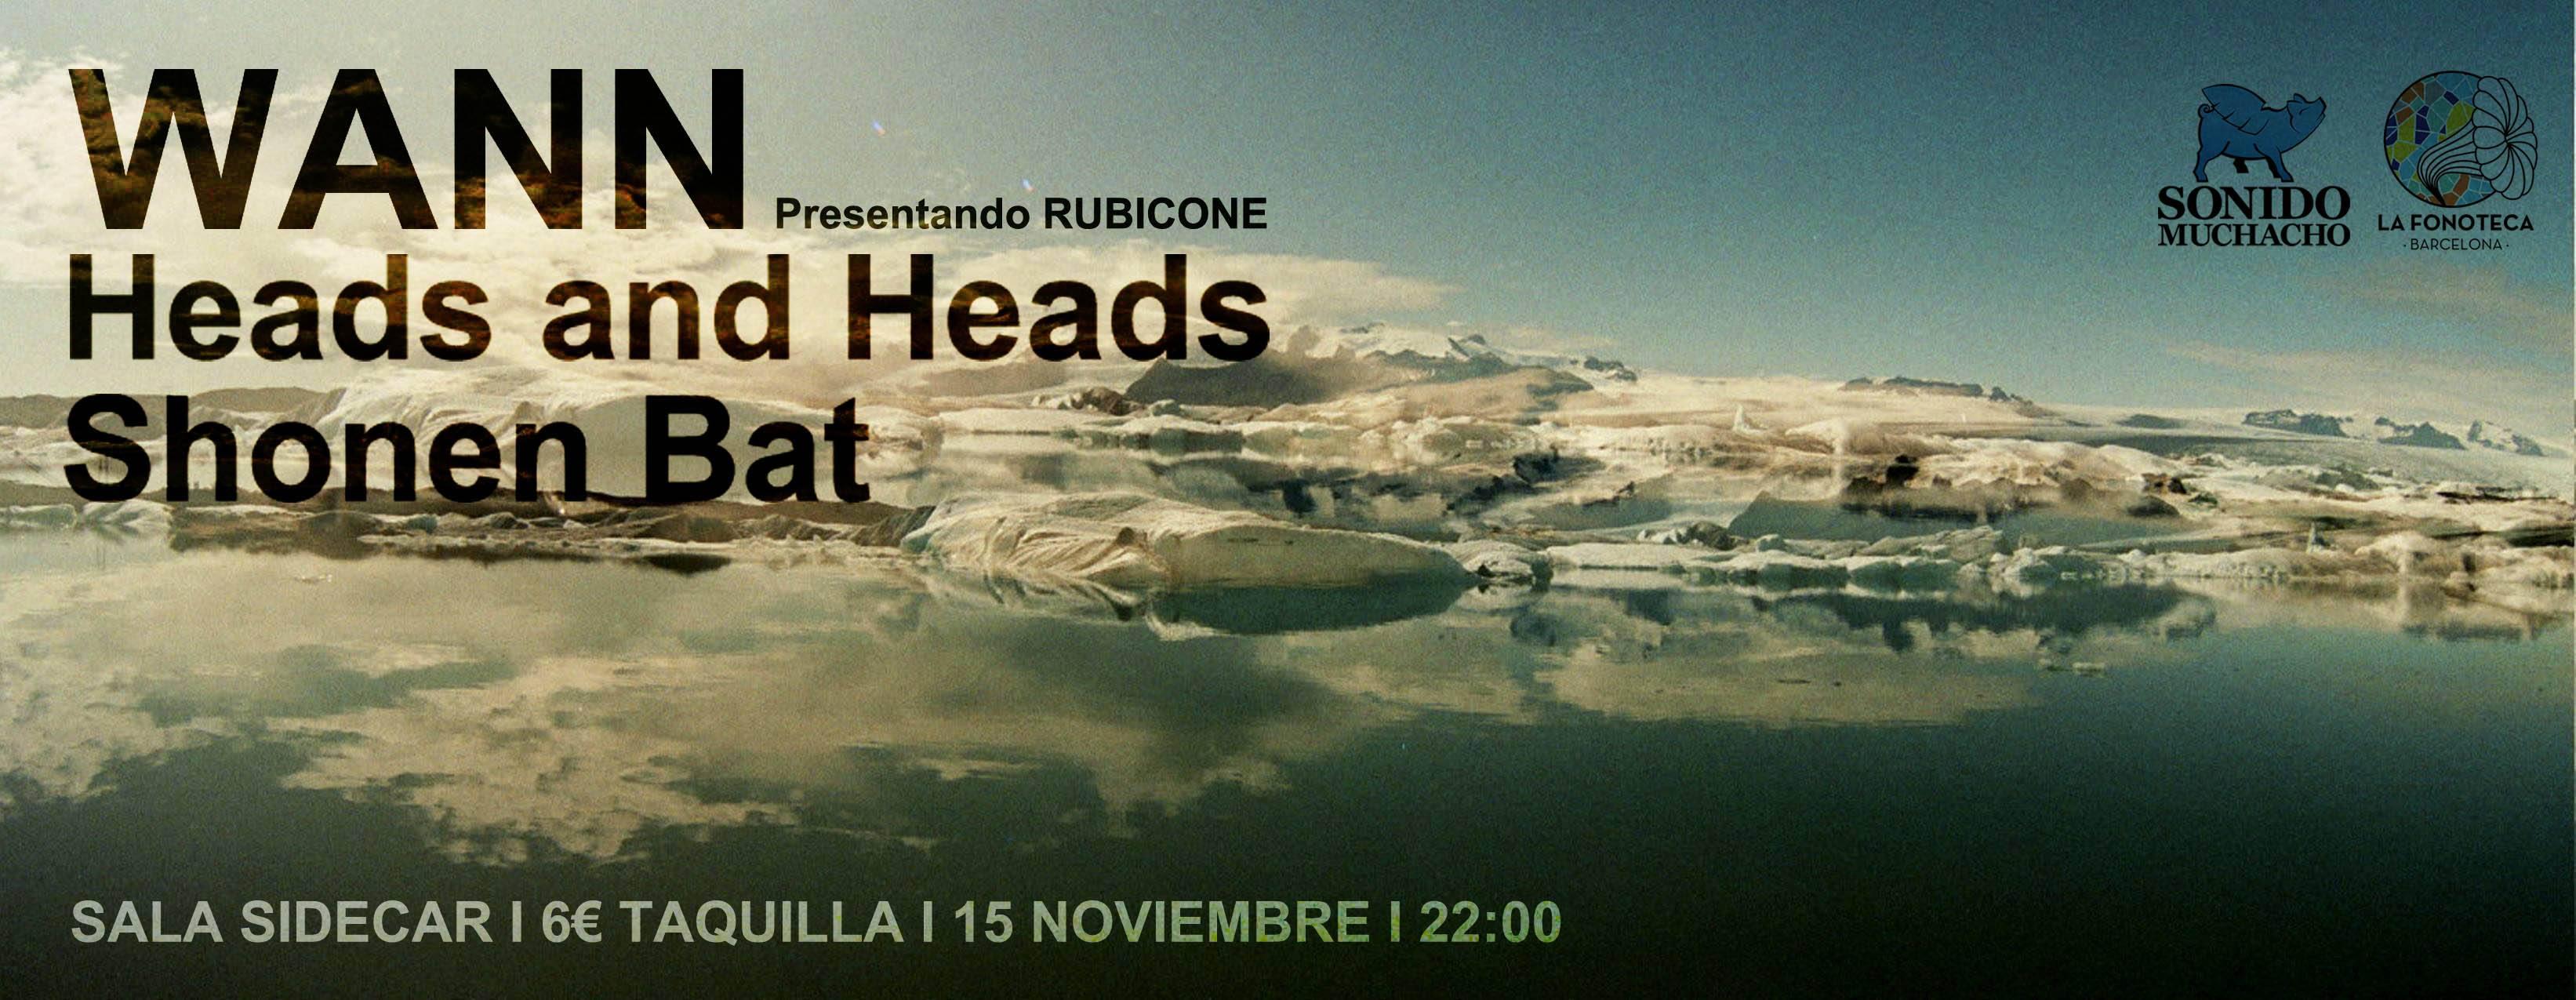 Wann presenta mañana en Barcelona su esperado primer LP, Rubicone